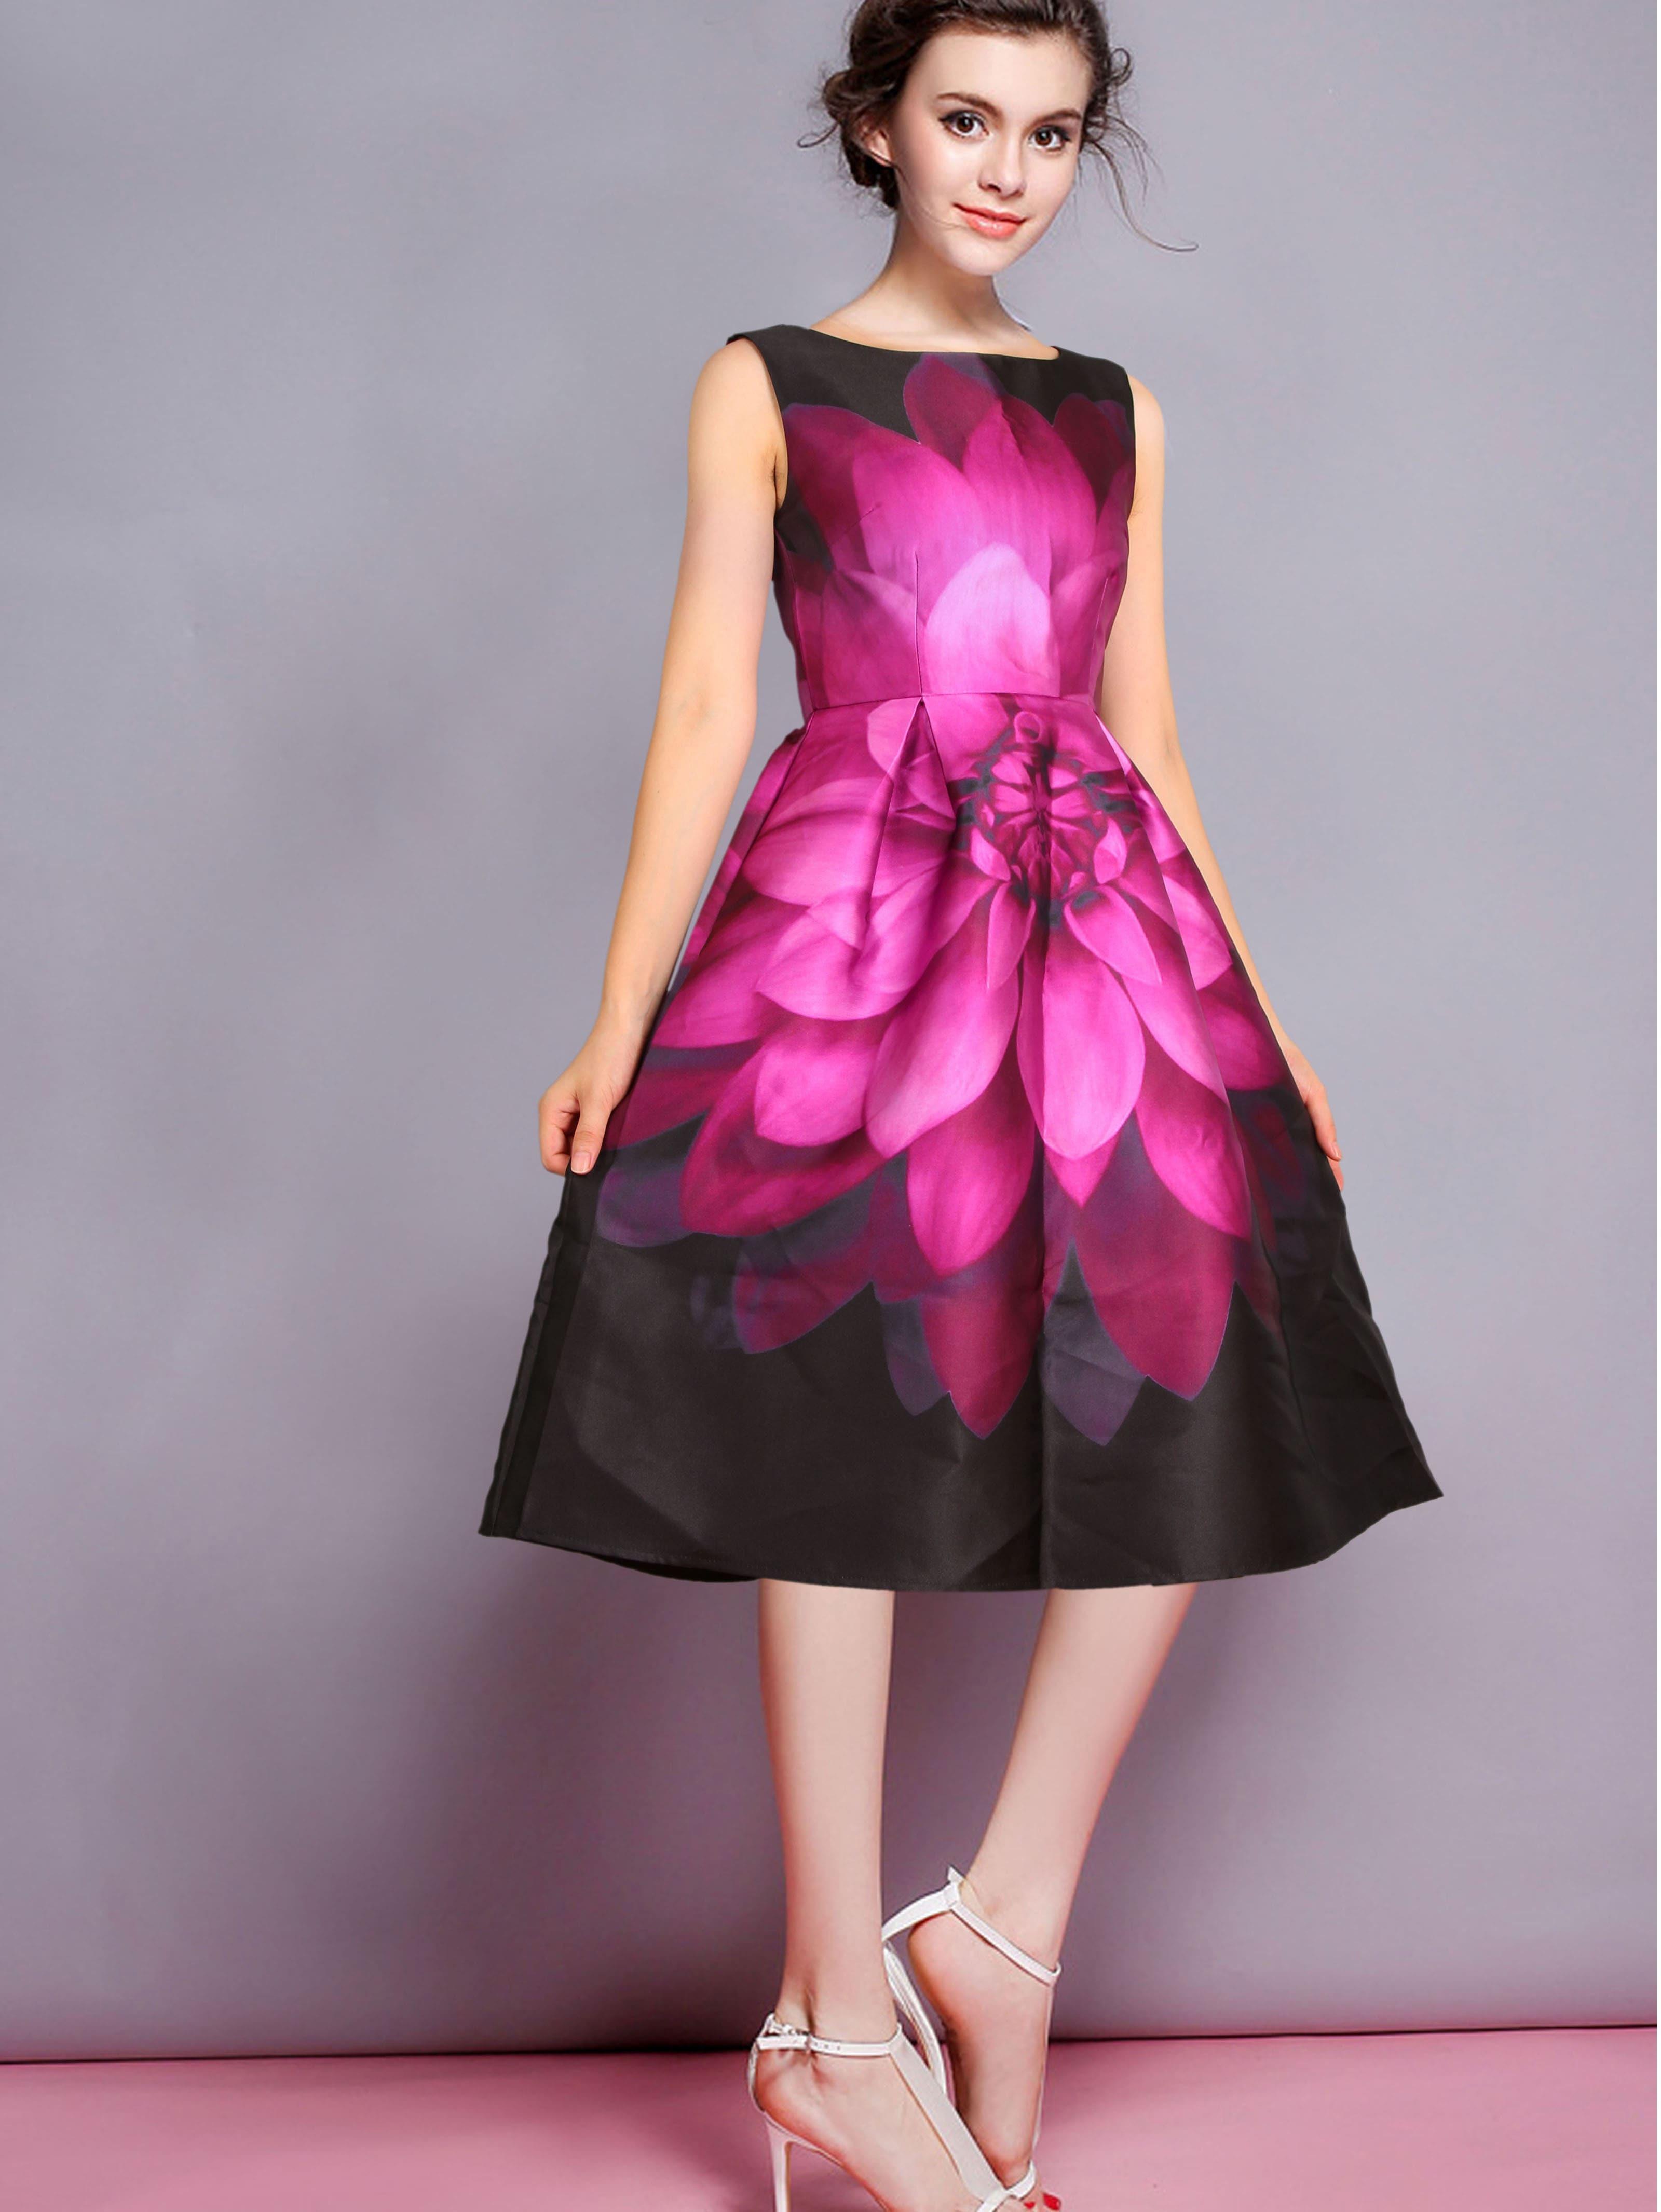 Sleeveless Florals Patterned Flare Frocks Dress EmmaCloth-Women Fast ...